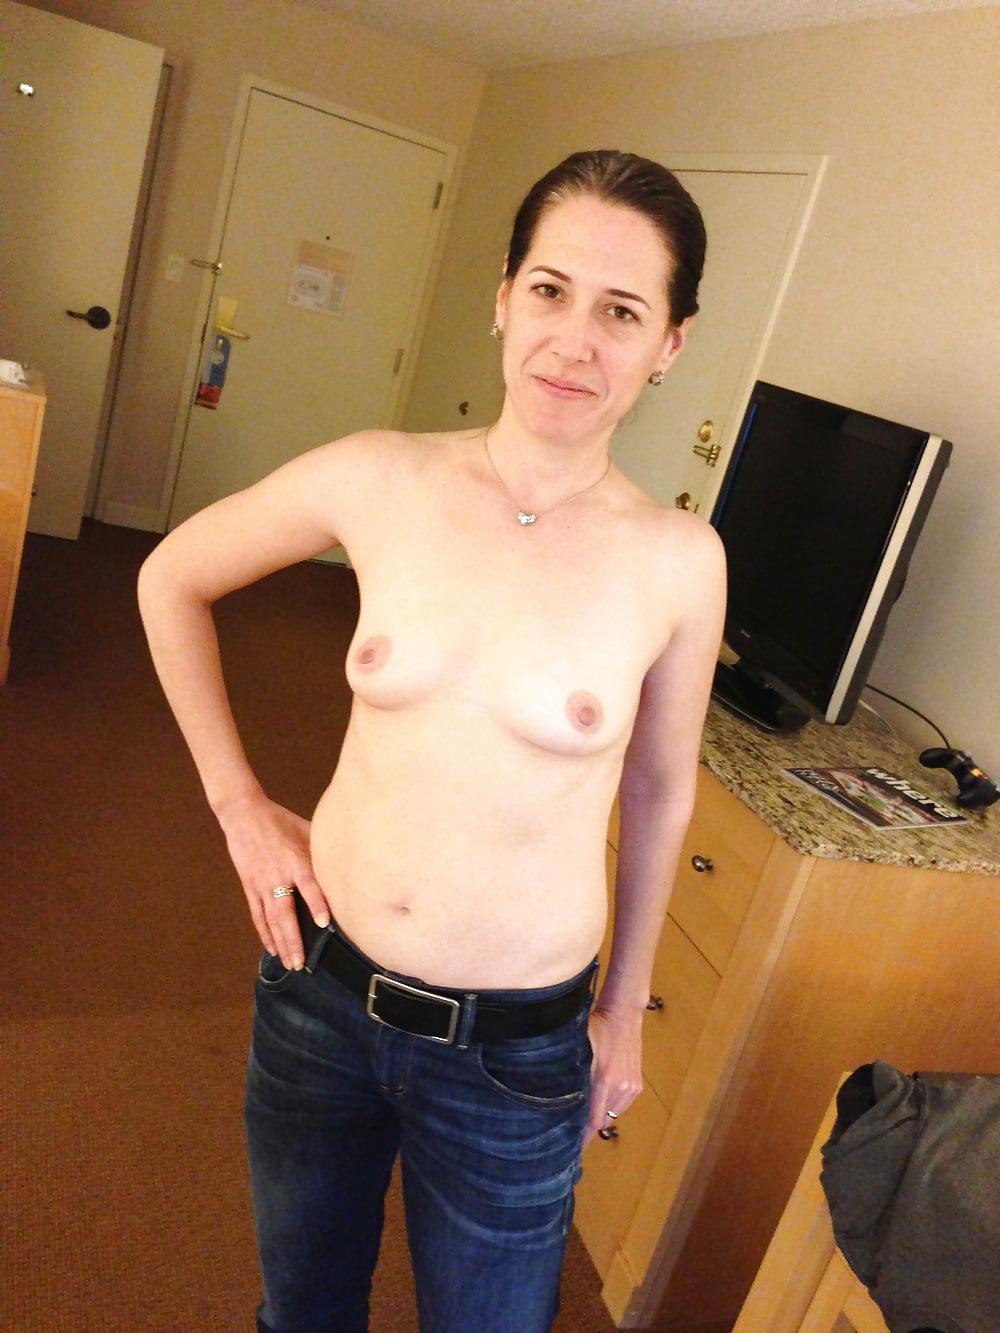 Milf flat breasts, pussy cumming vidoes